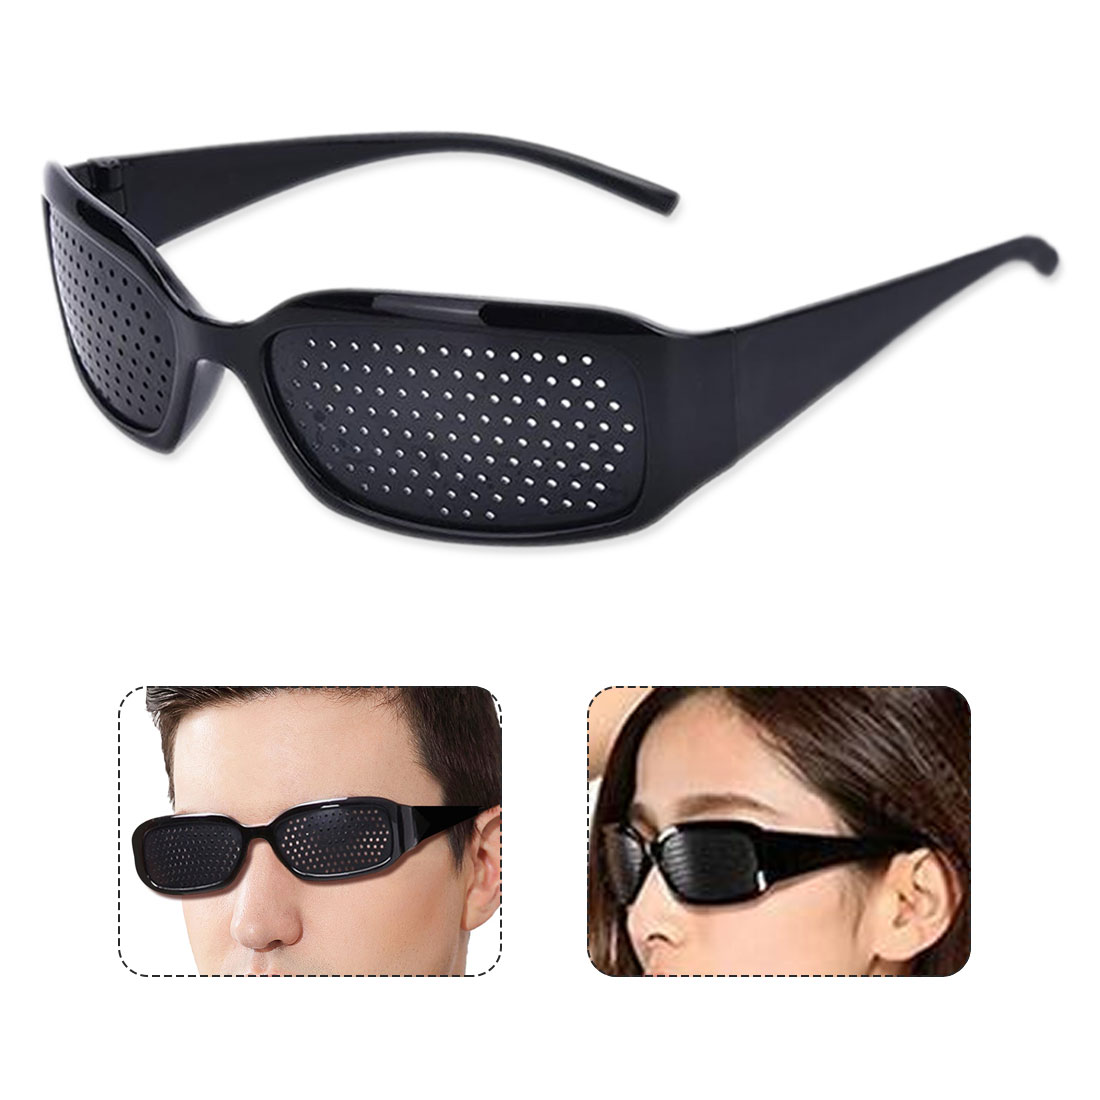 Hot Black Unisex Vision Care Pin Hole Eyeglasses Pinhole